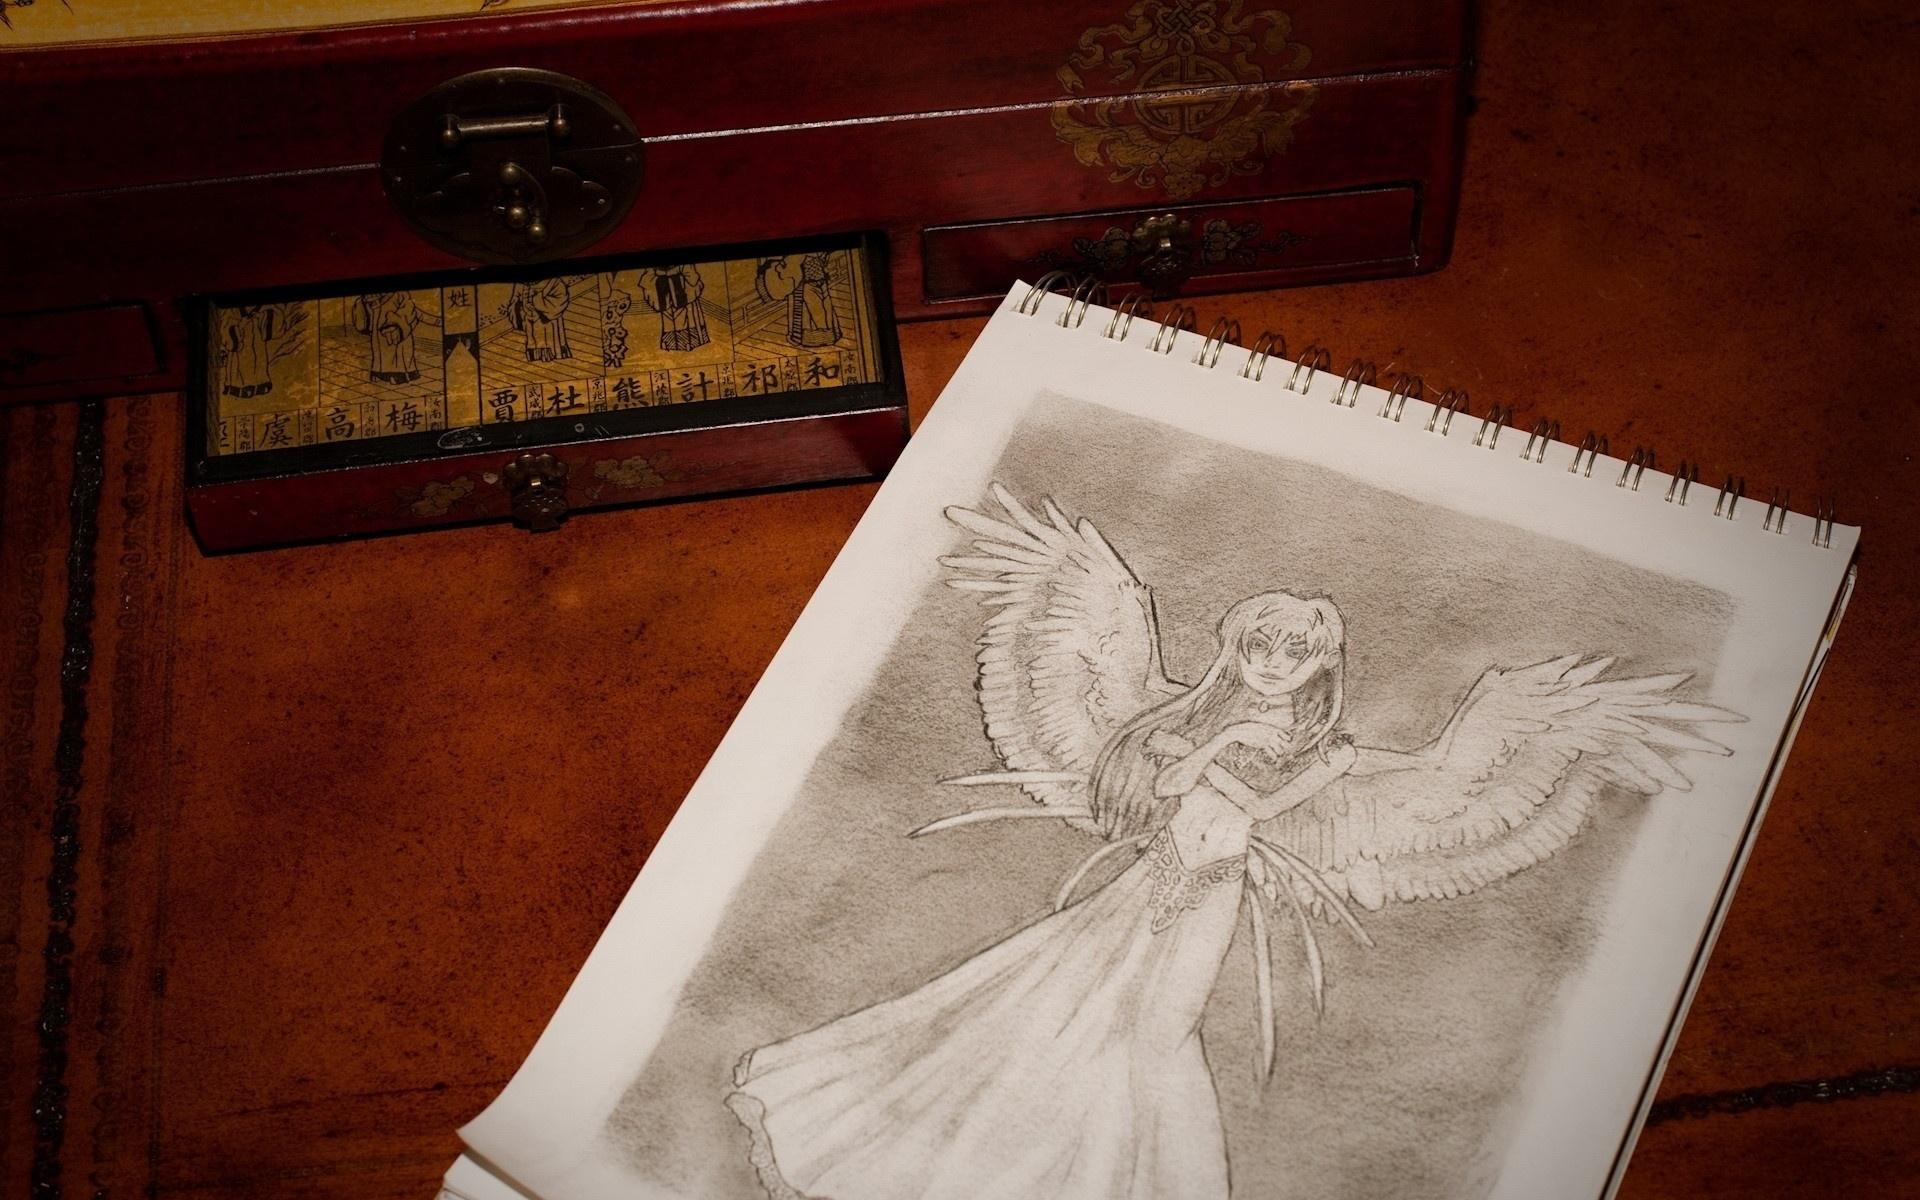 аниме рисунки ангелов карандашом: